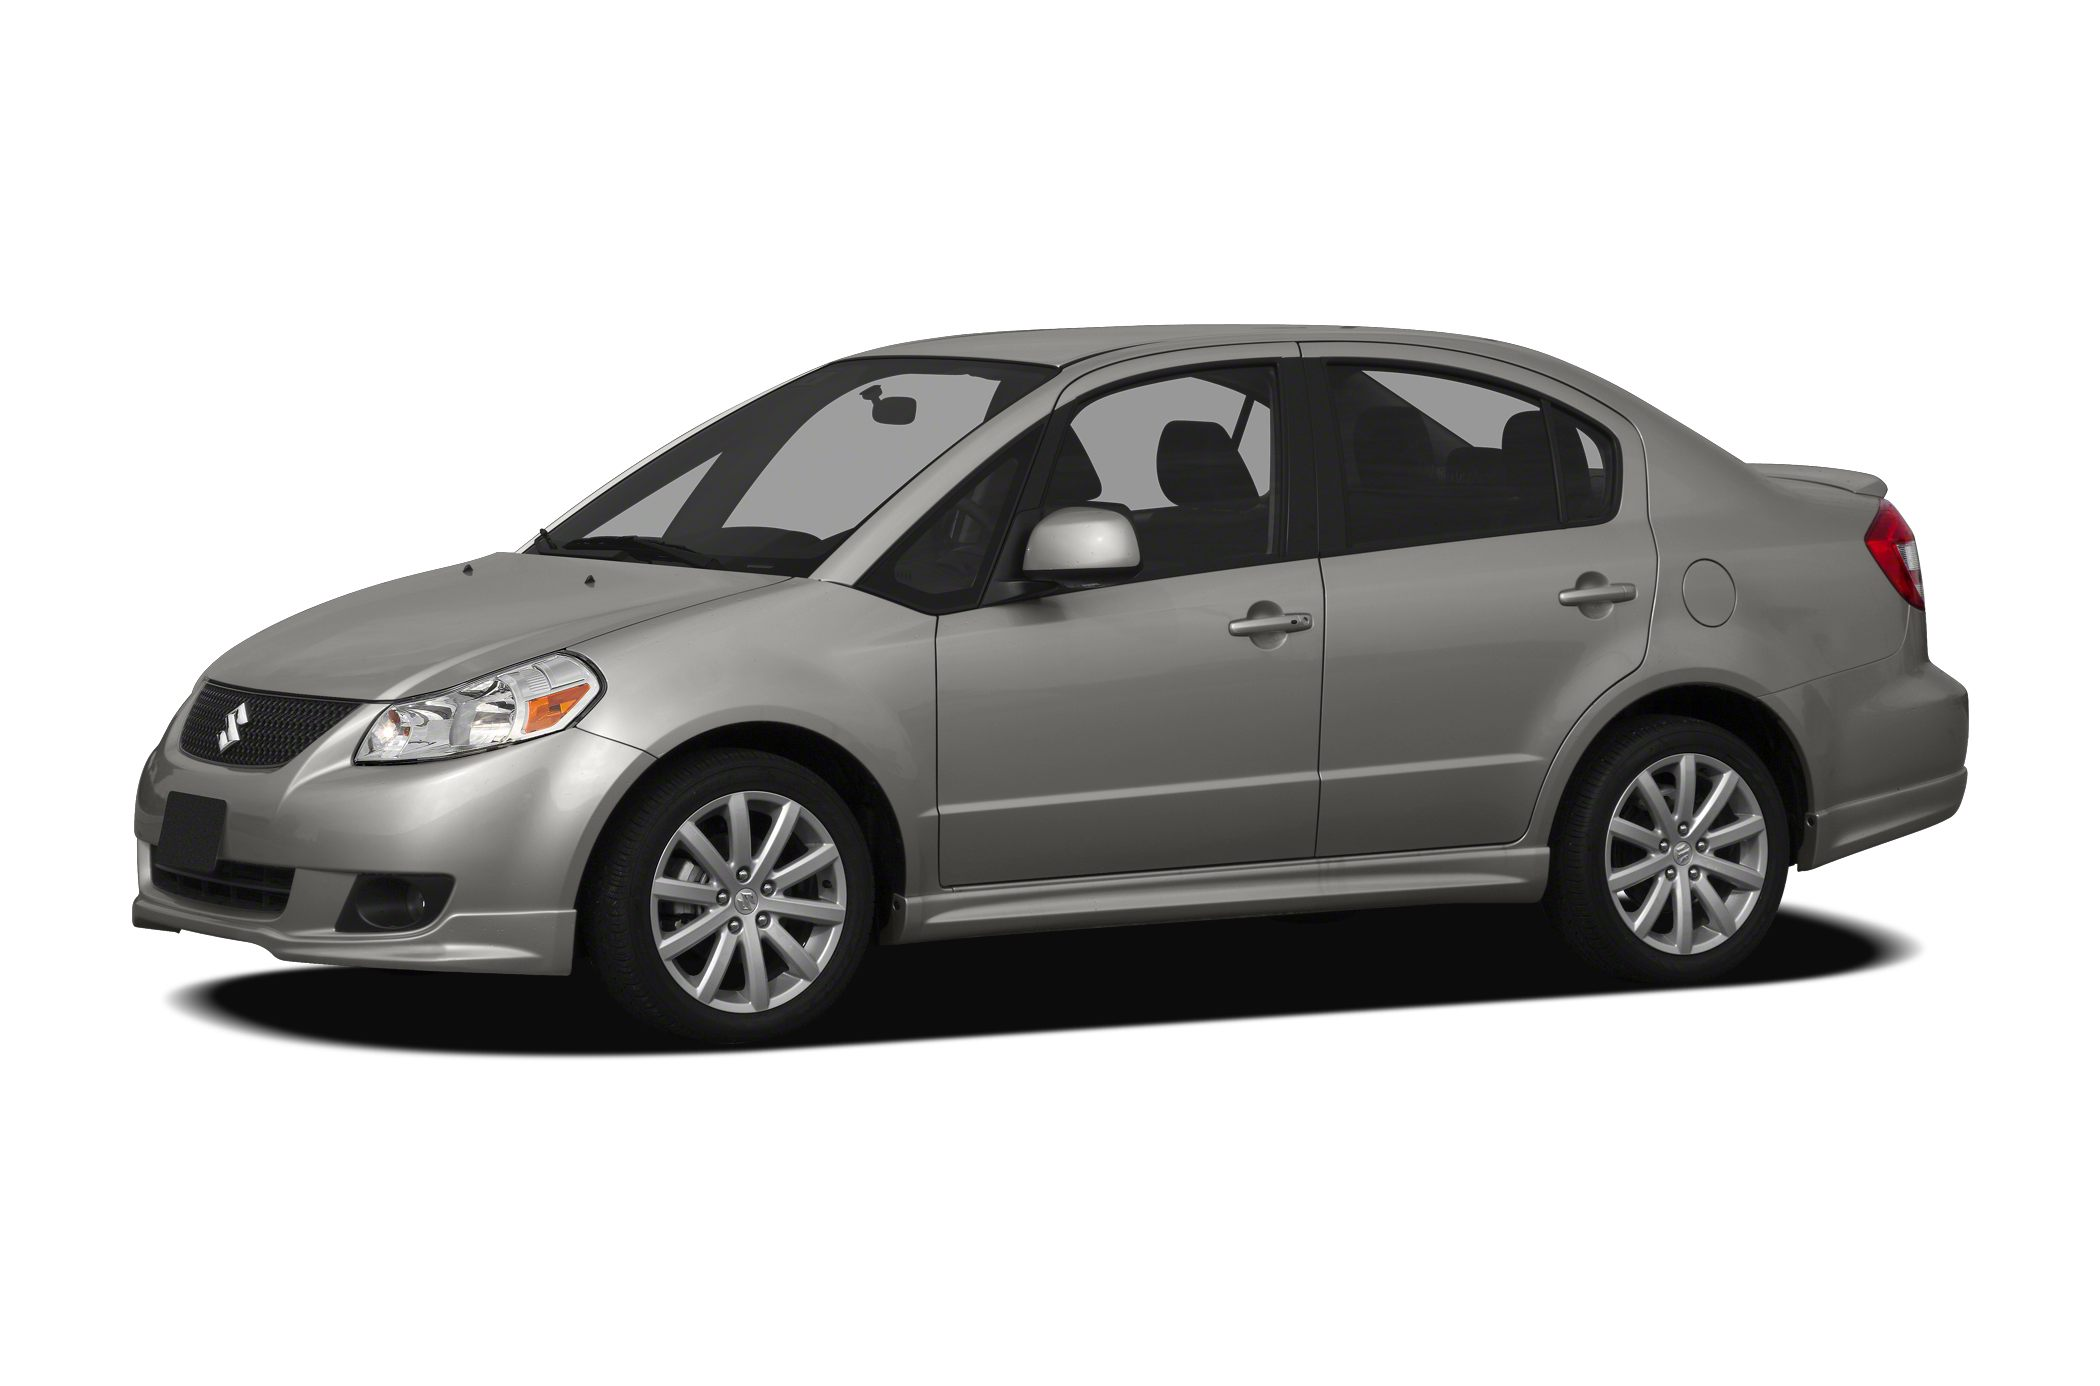 2012 Suzuki SX4 LE Sedan for sale in Altoona for $12,988 with 30,314 miles